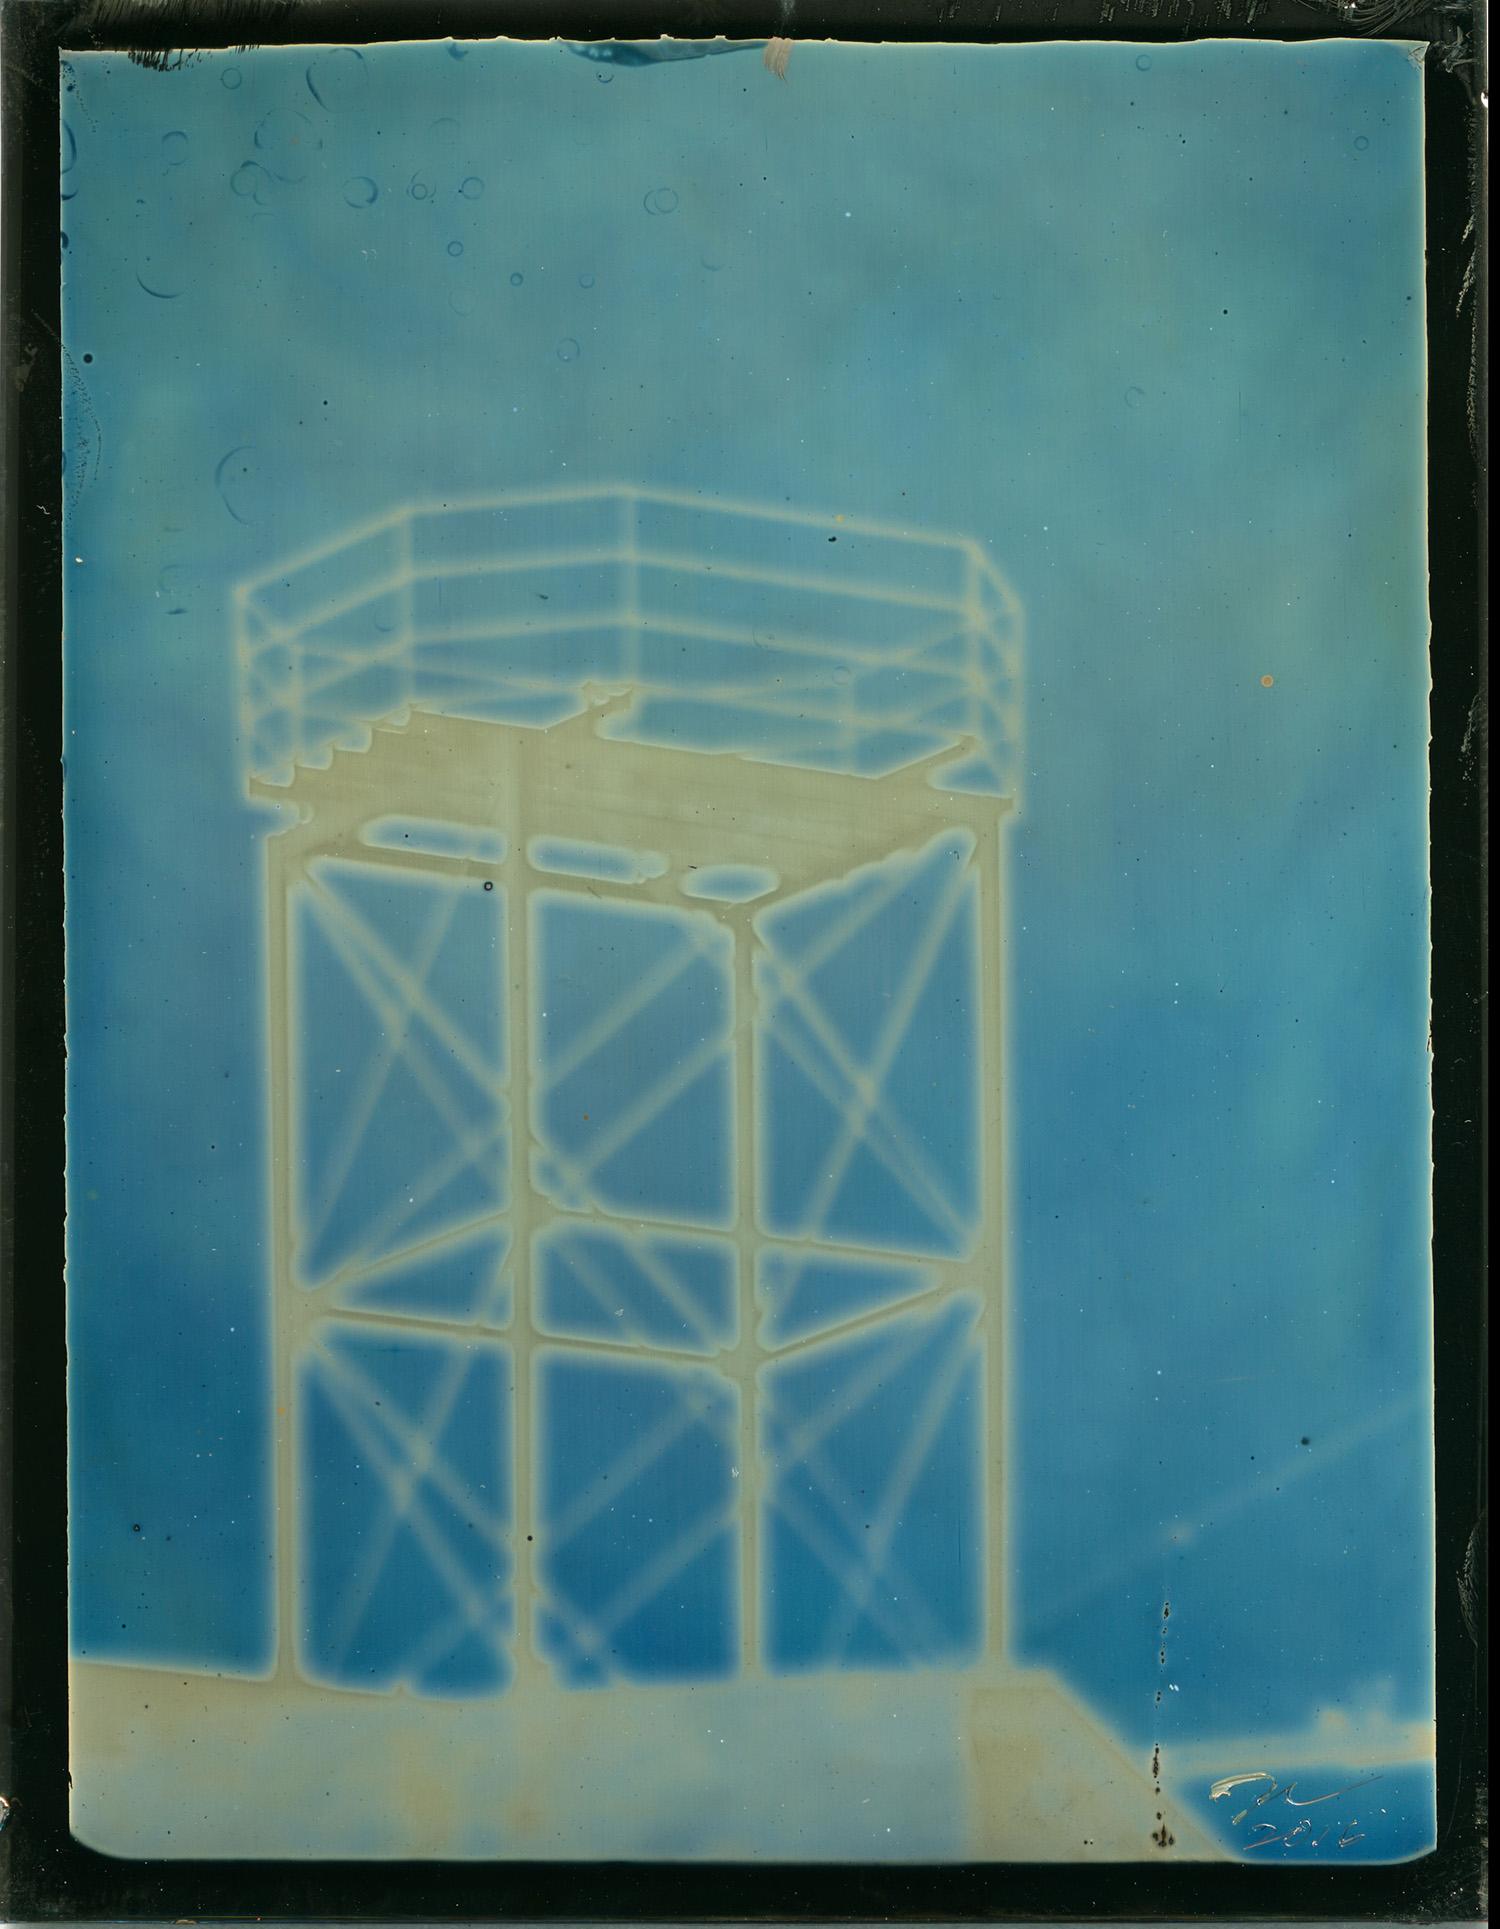 Water Tower, Unique daguerrotype, 2015 © Daniel Carrillo